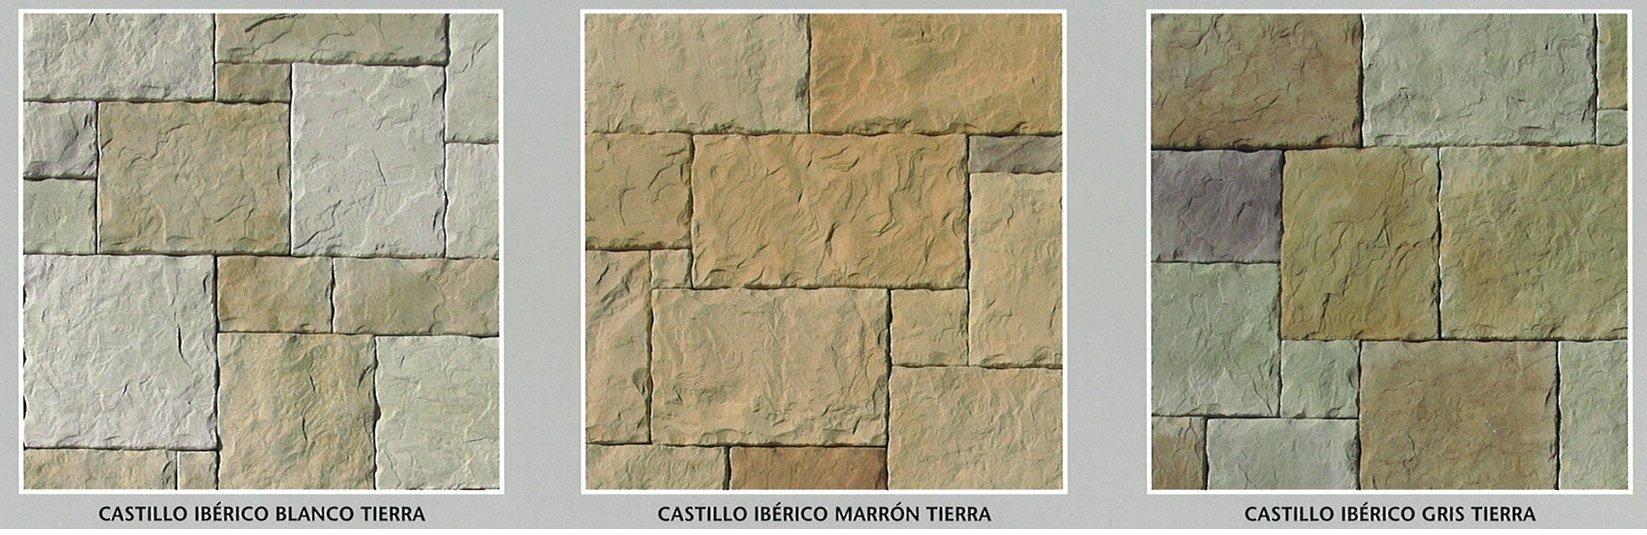 piedra cultivada castillo iberico modelos